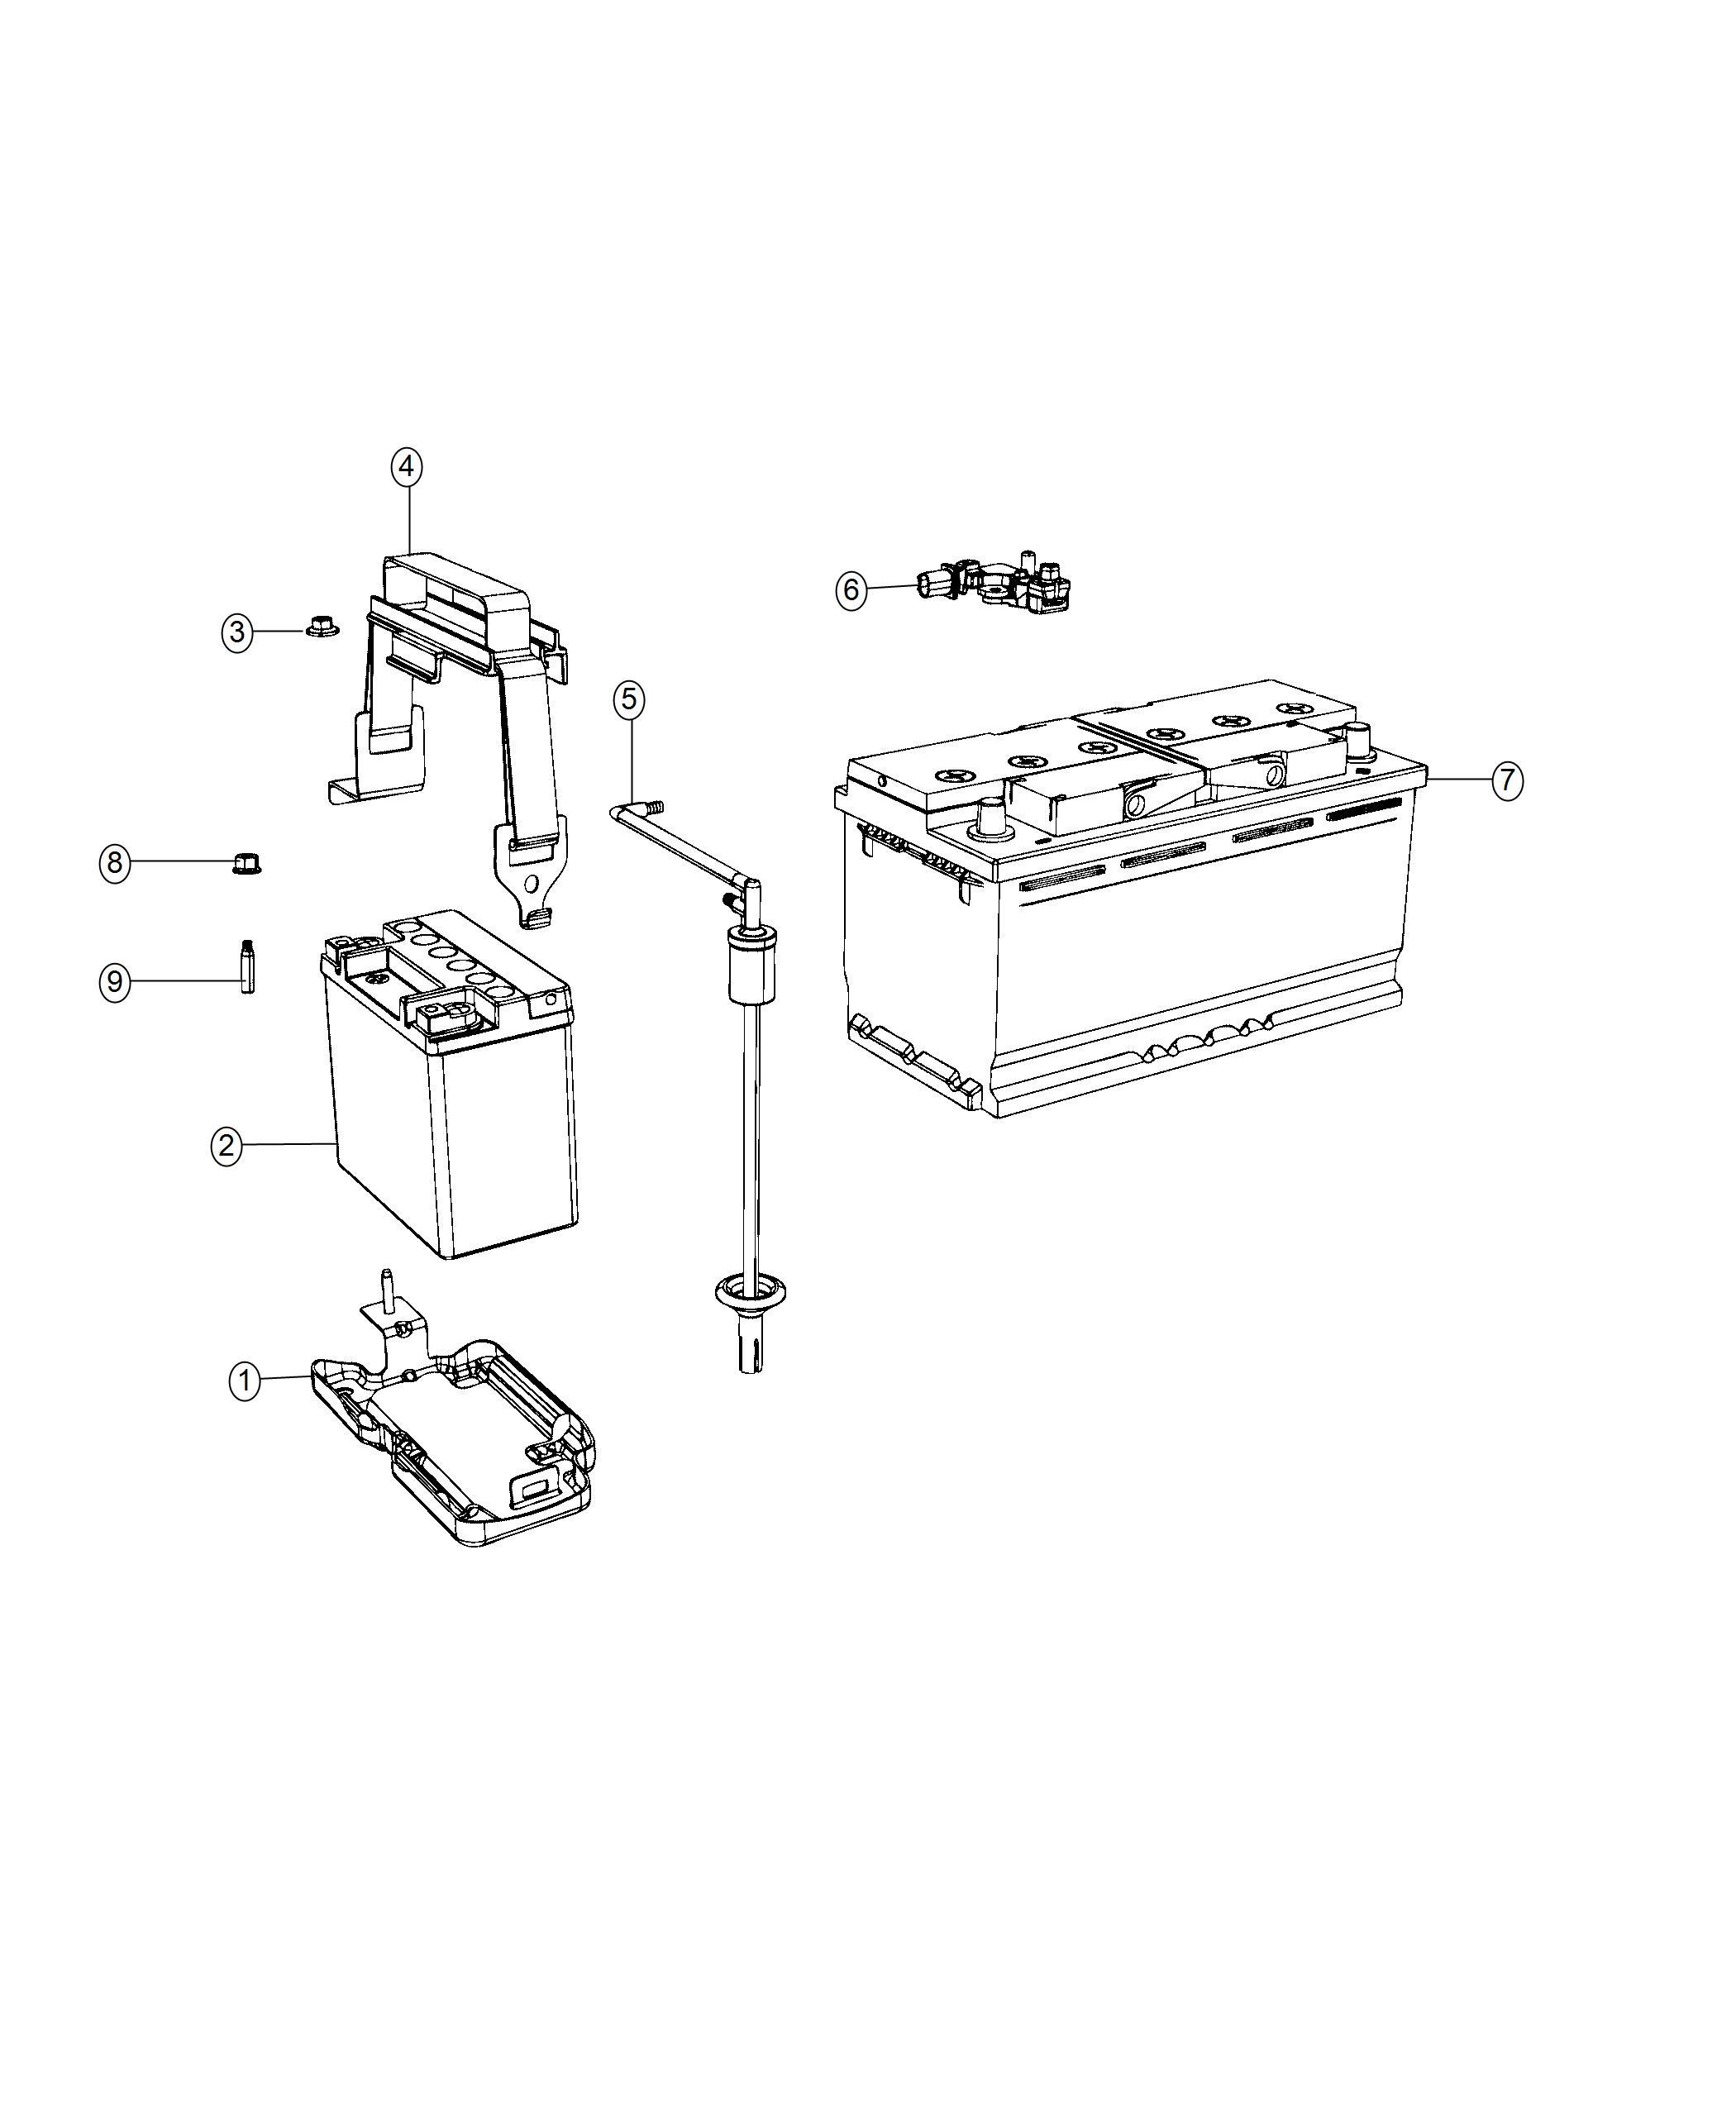 2004 Jeep Grand Cherokee Sensor. Battery. Negative cable